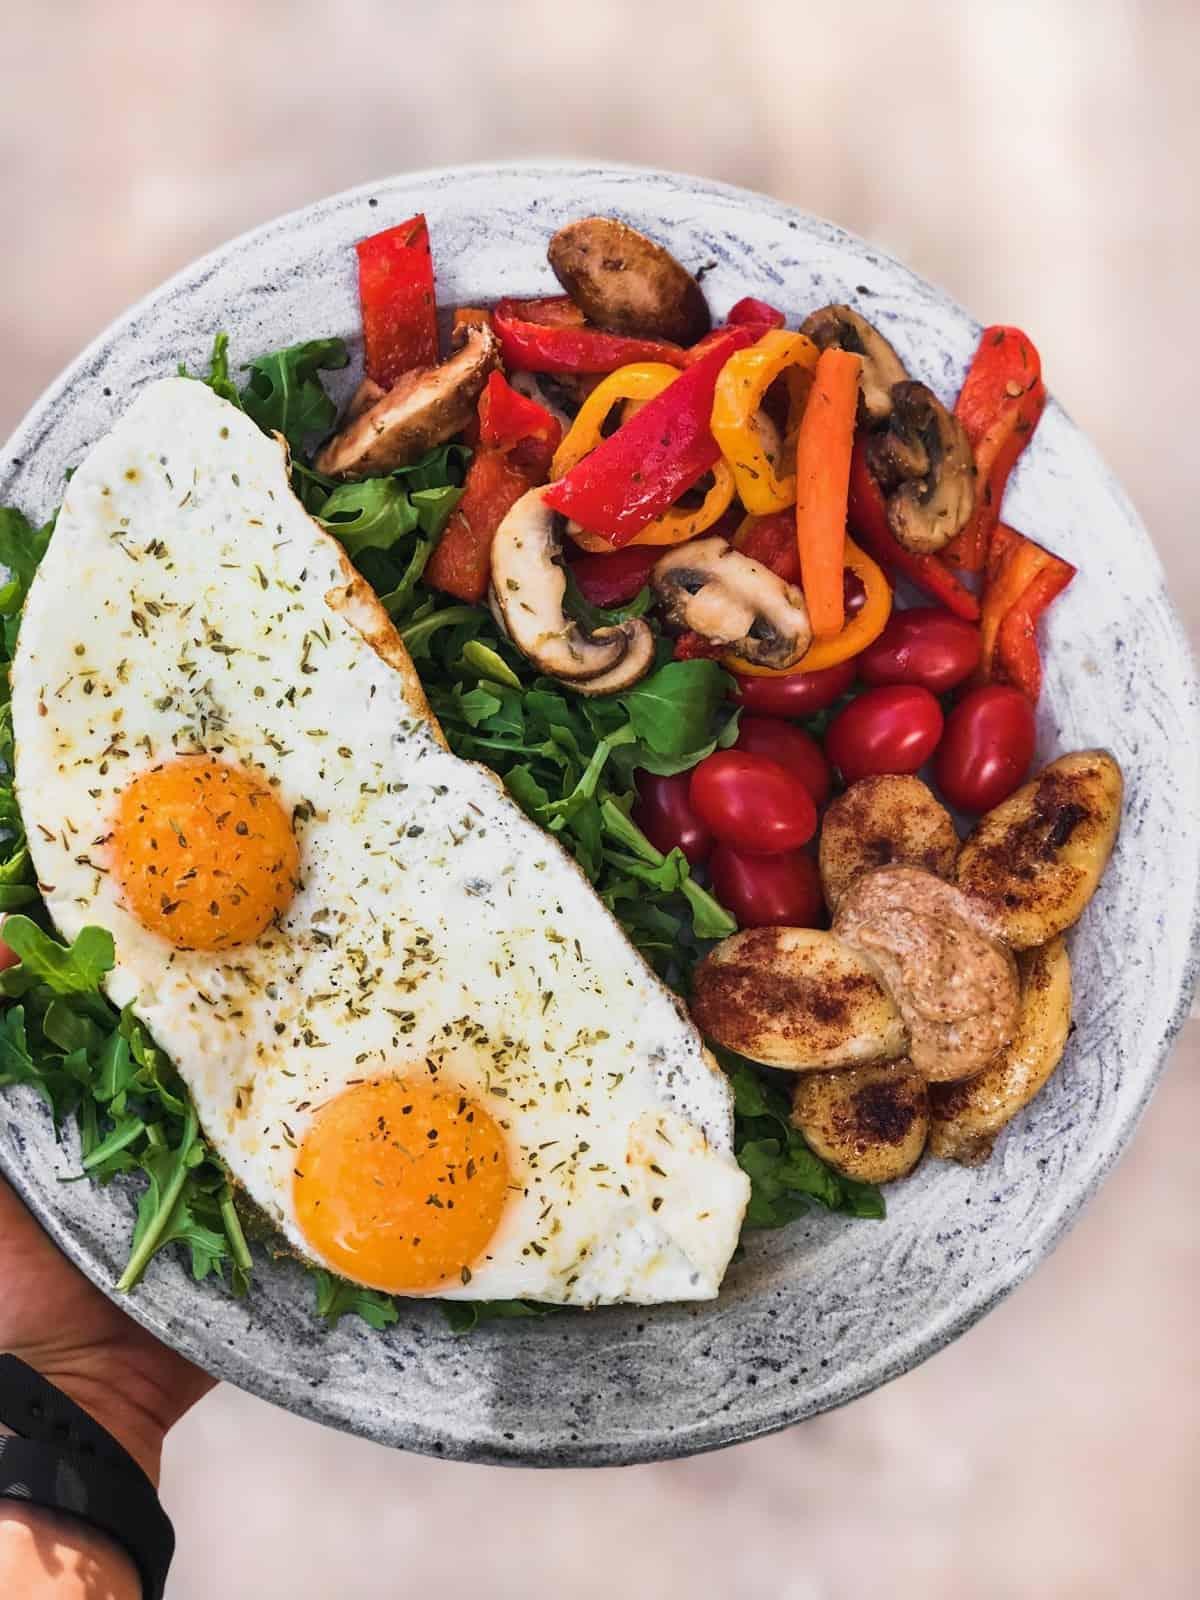 Plate of greens, 2 fried eggs, sautéed veggies, and a sautéed banana with almond butter